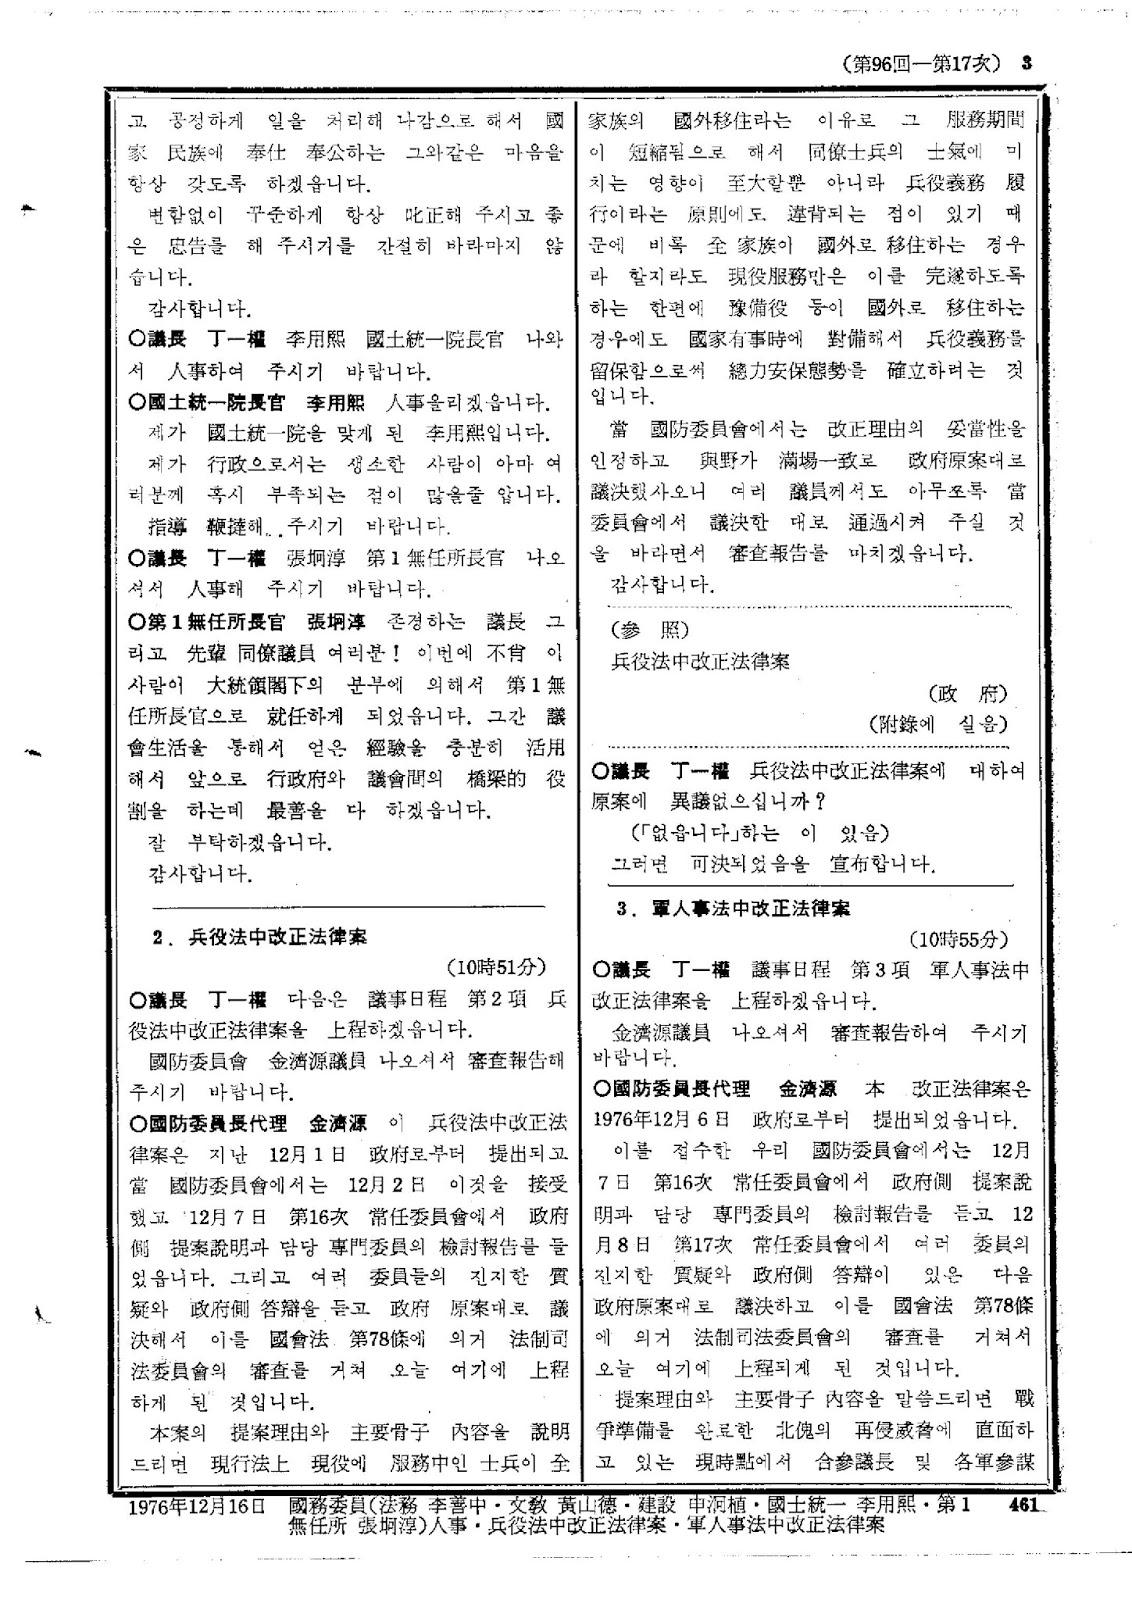 GOKI2: 外交機関100M以内集会禁...